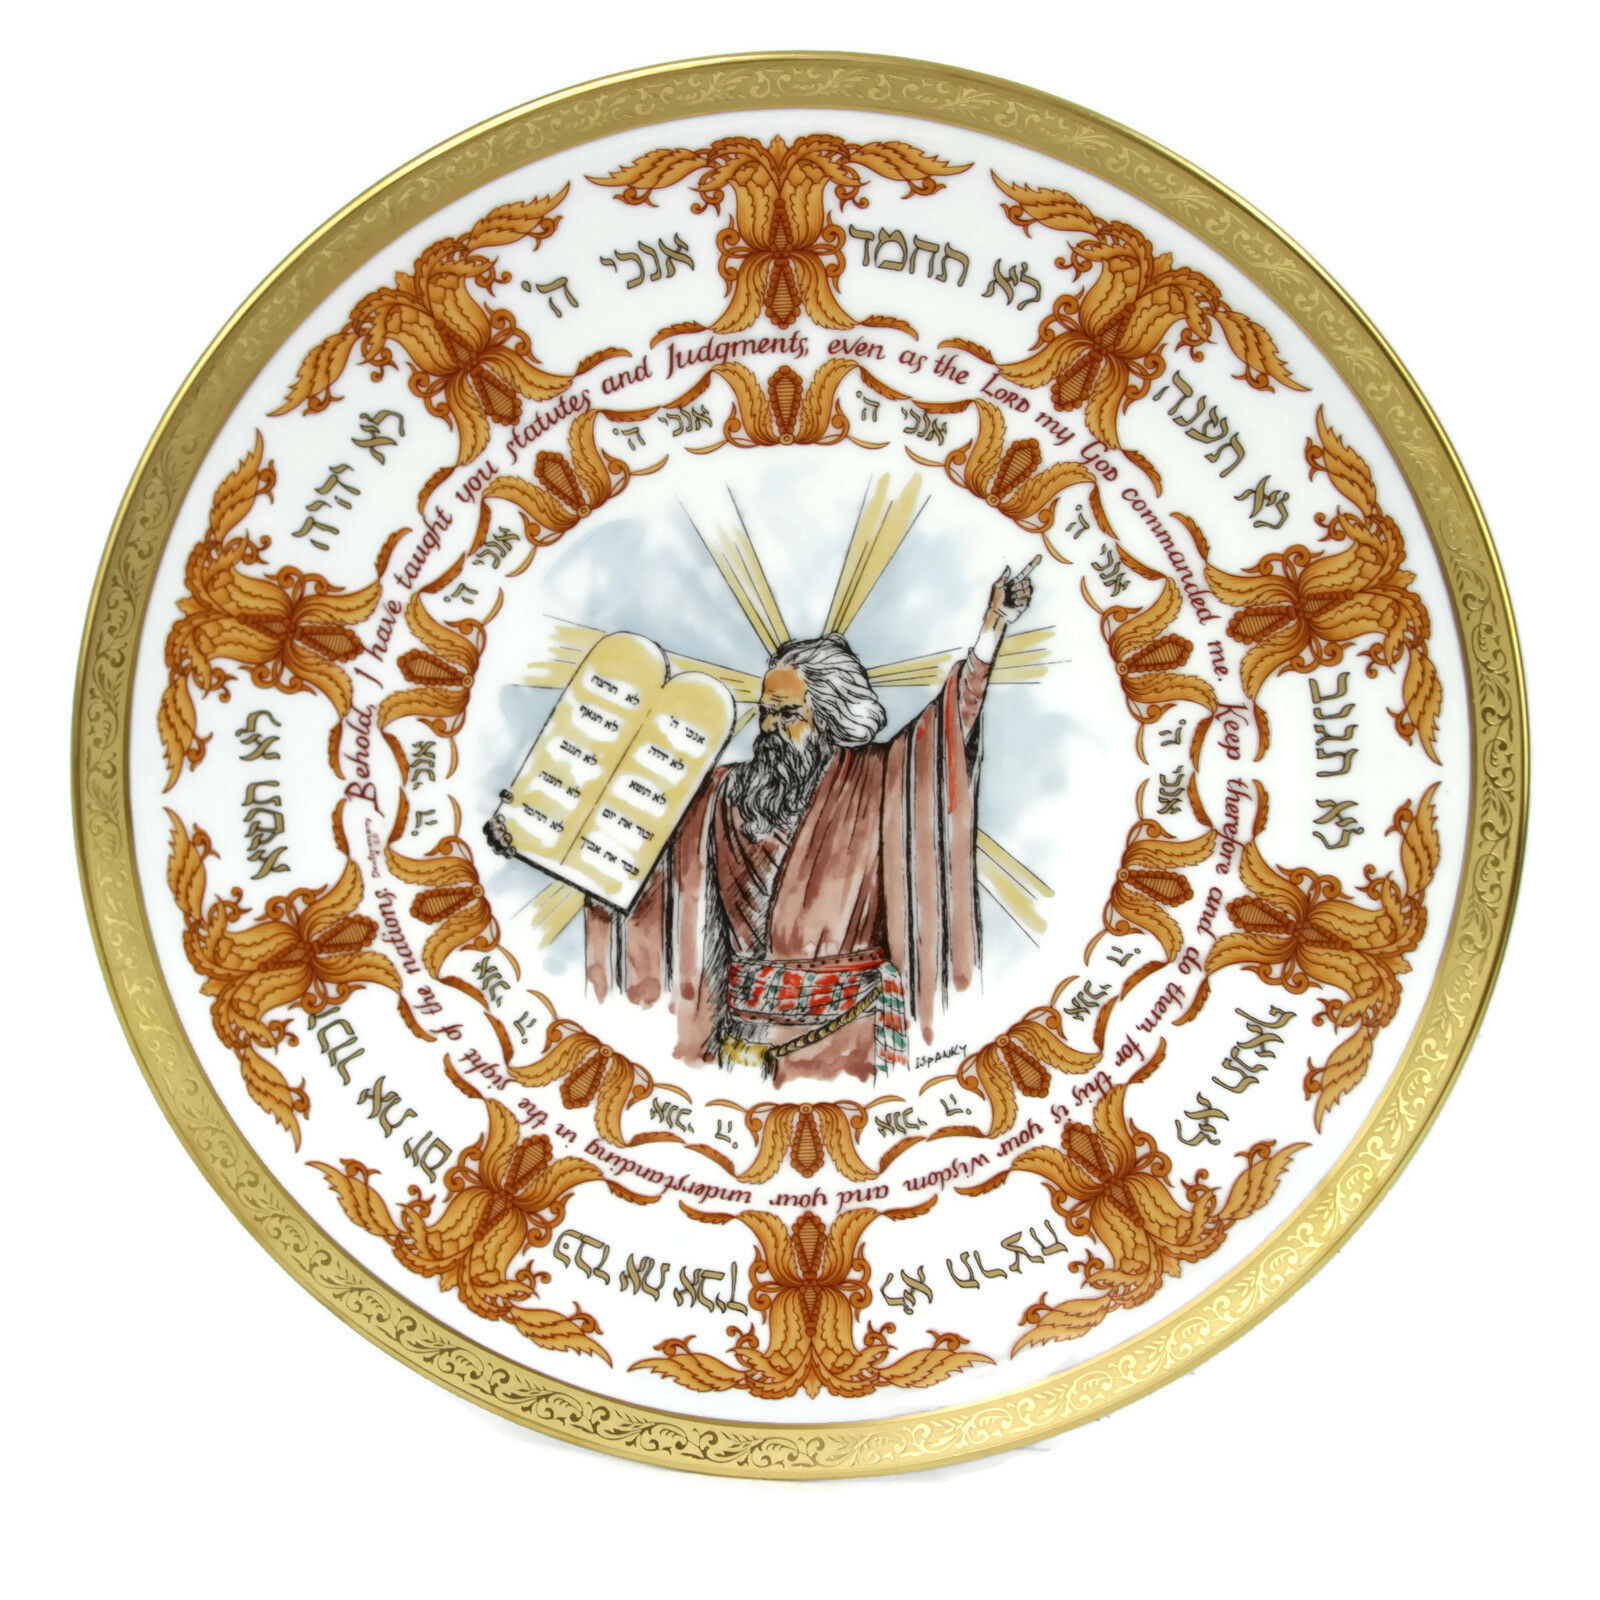 1979 Laszlo Ispanky Goebel The Ten Commandments Second Edition Plate With Box - $74.76